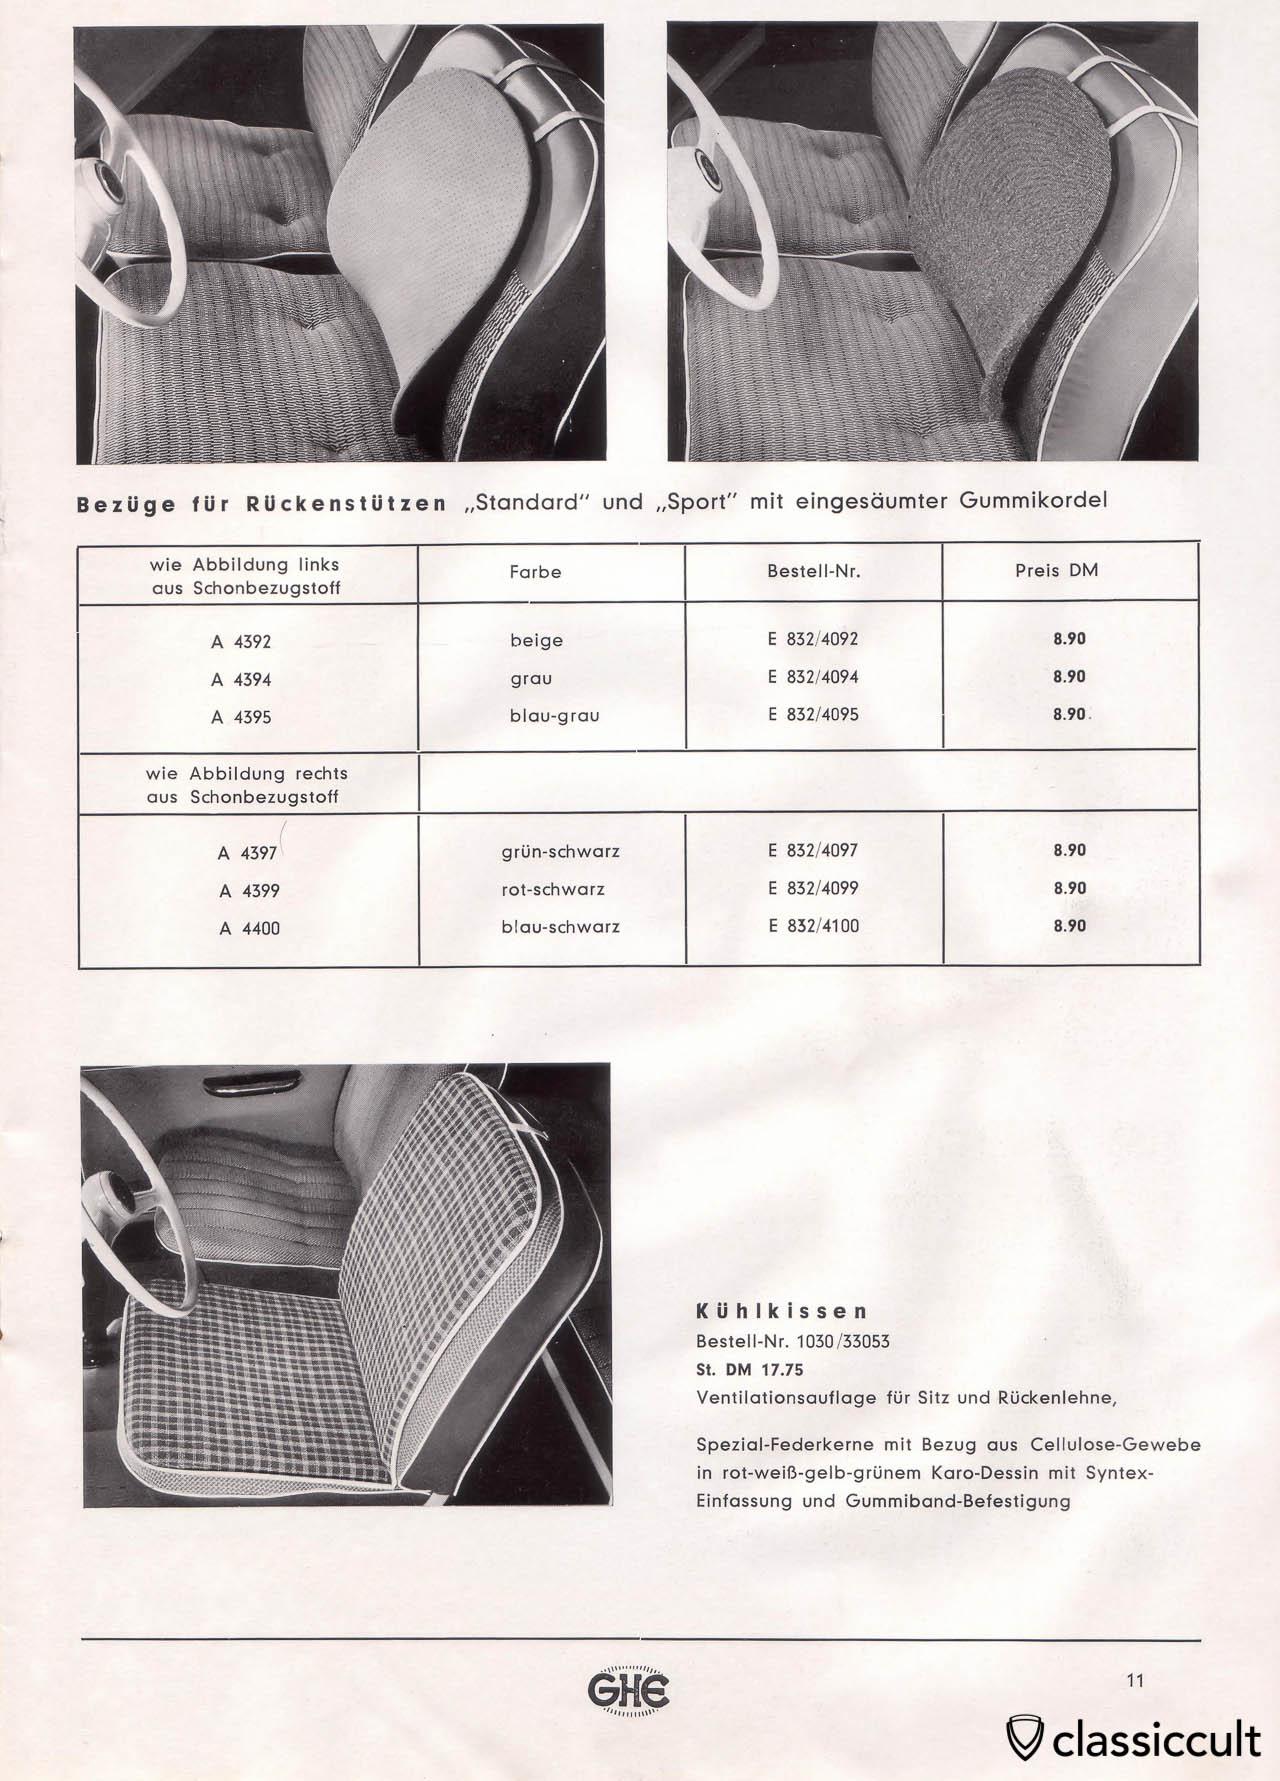 GHE Happich seat accessories